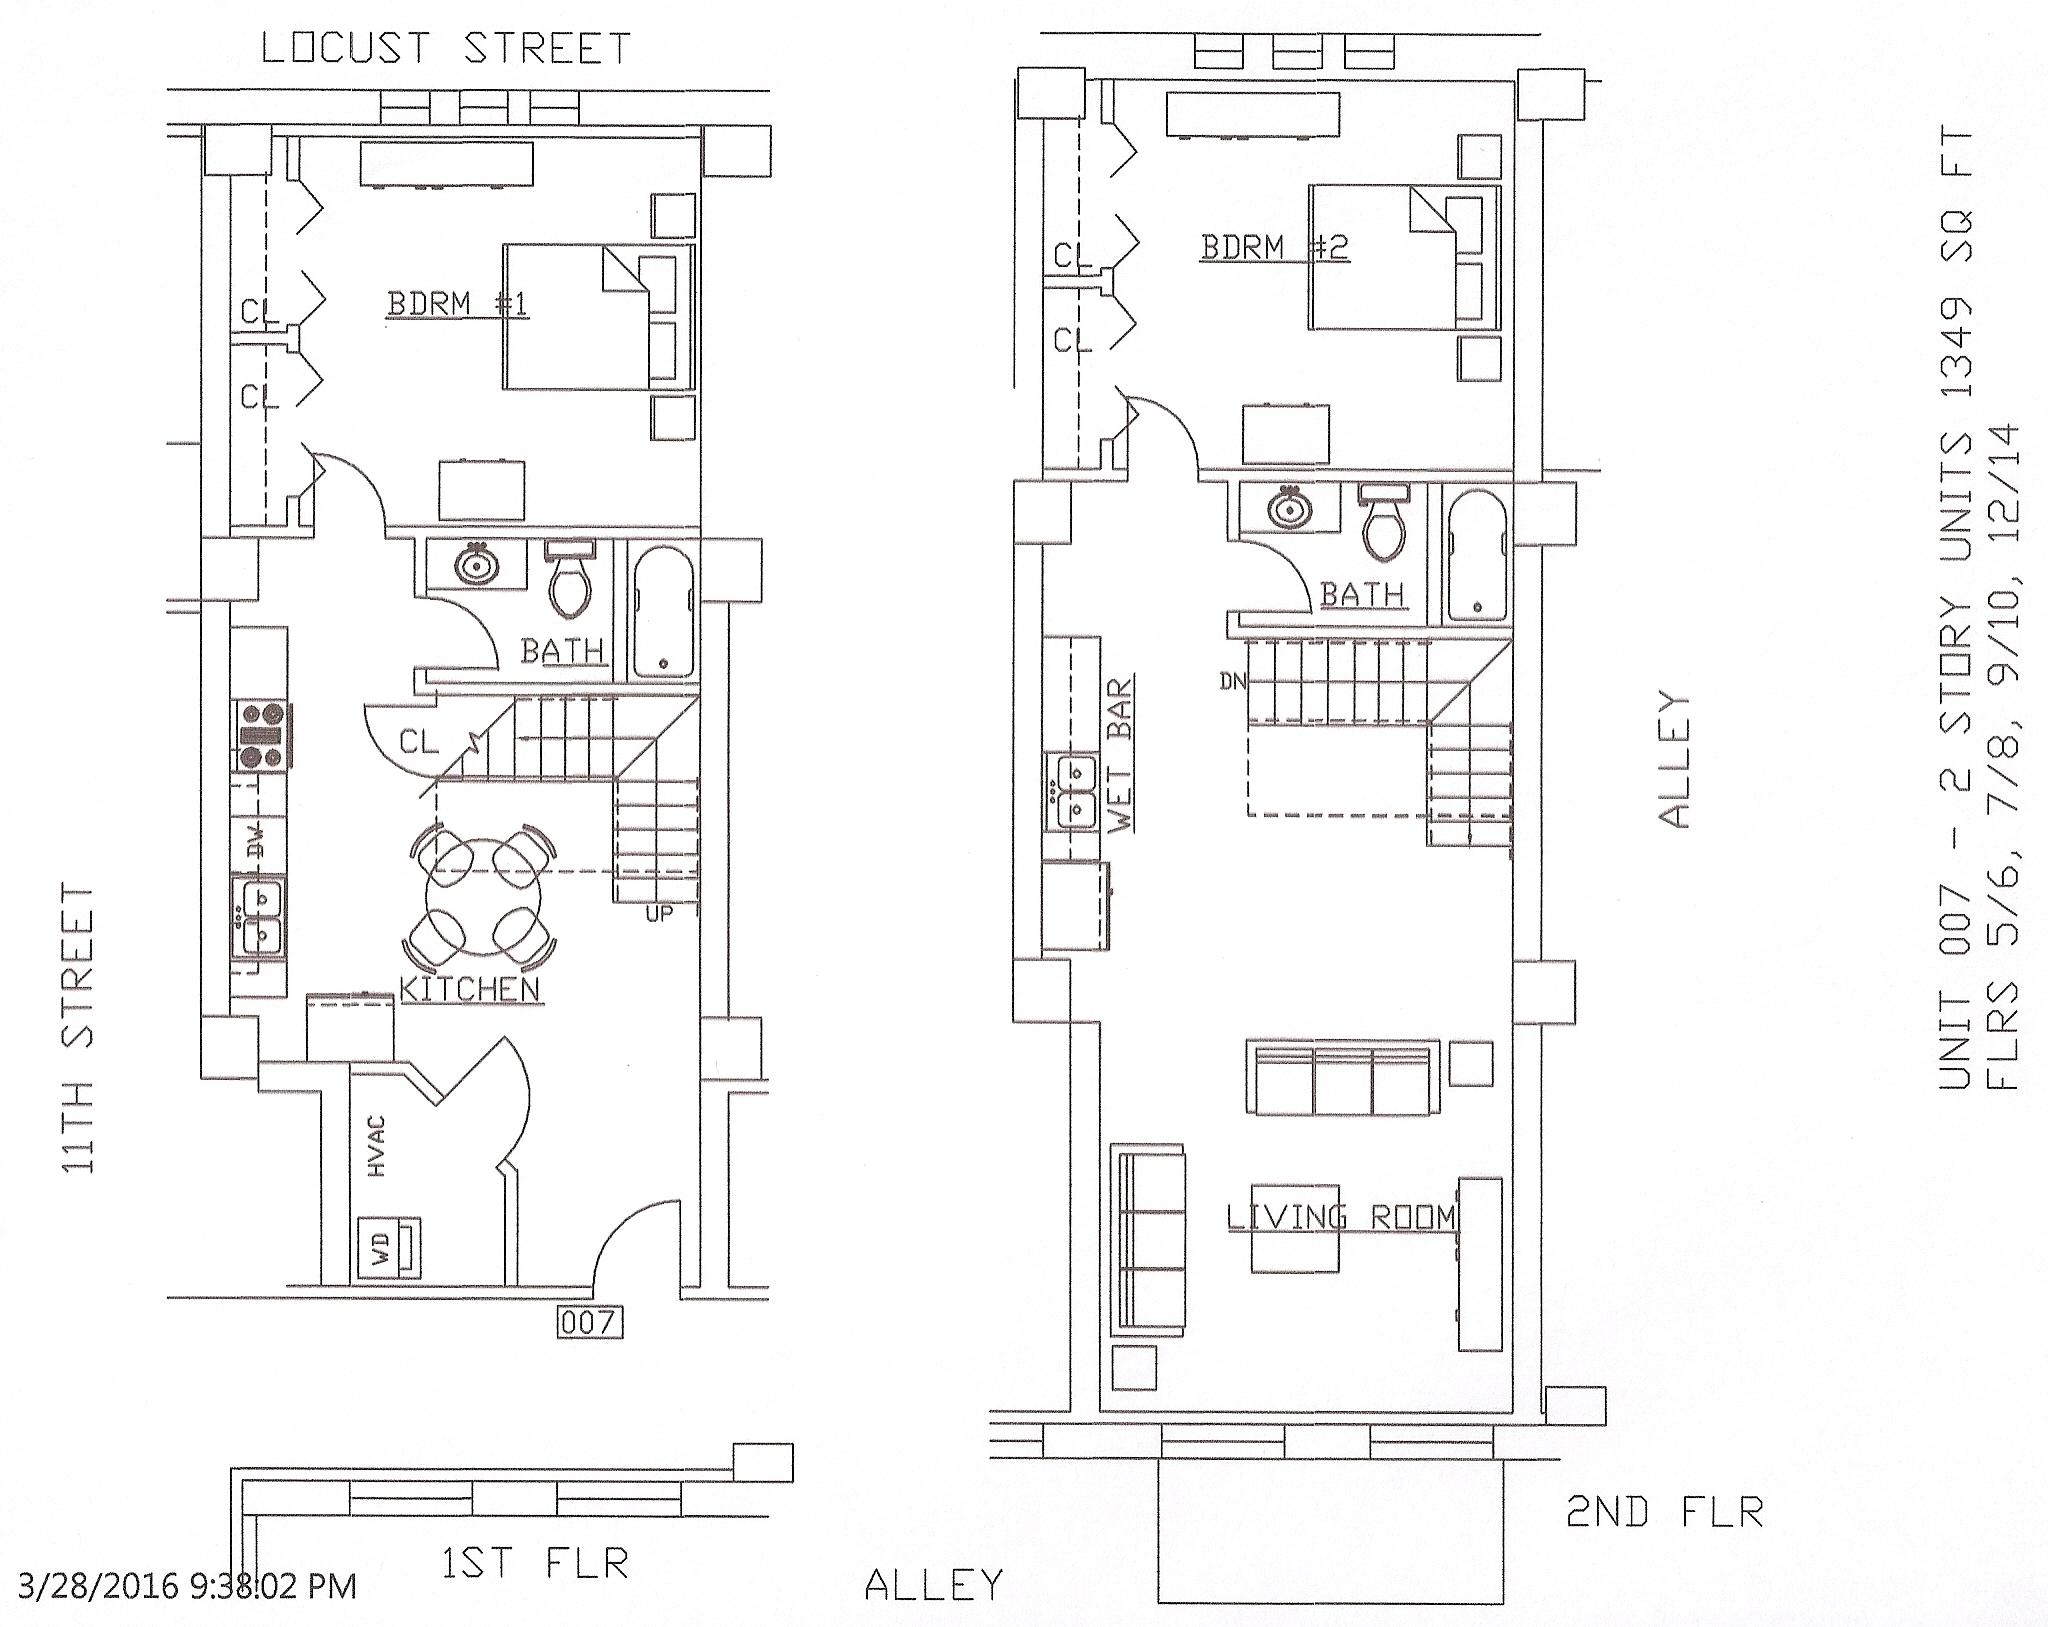 Unit 07, 1349 Square Feet